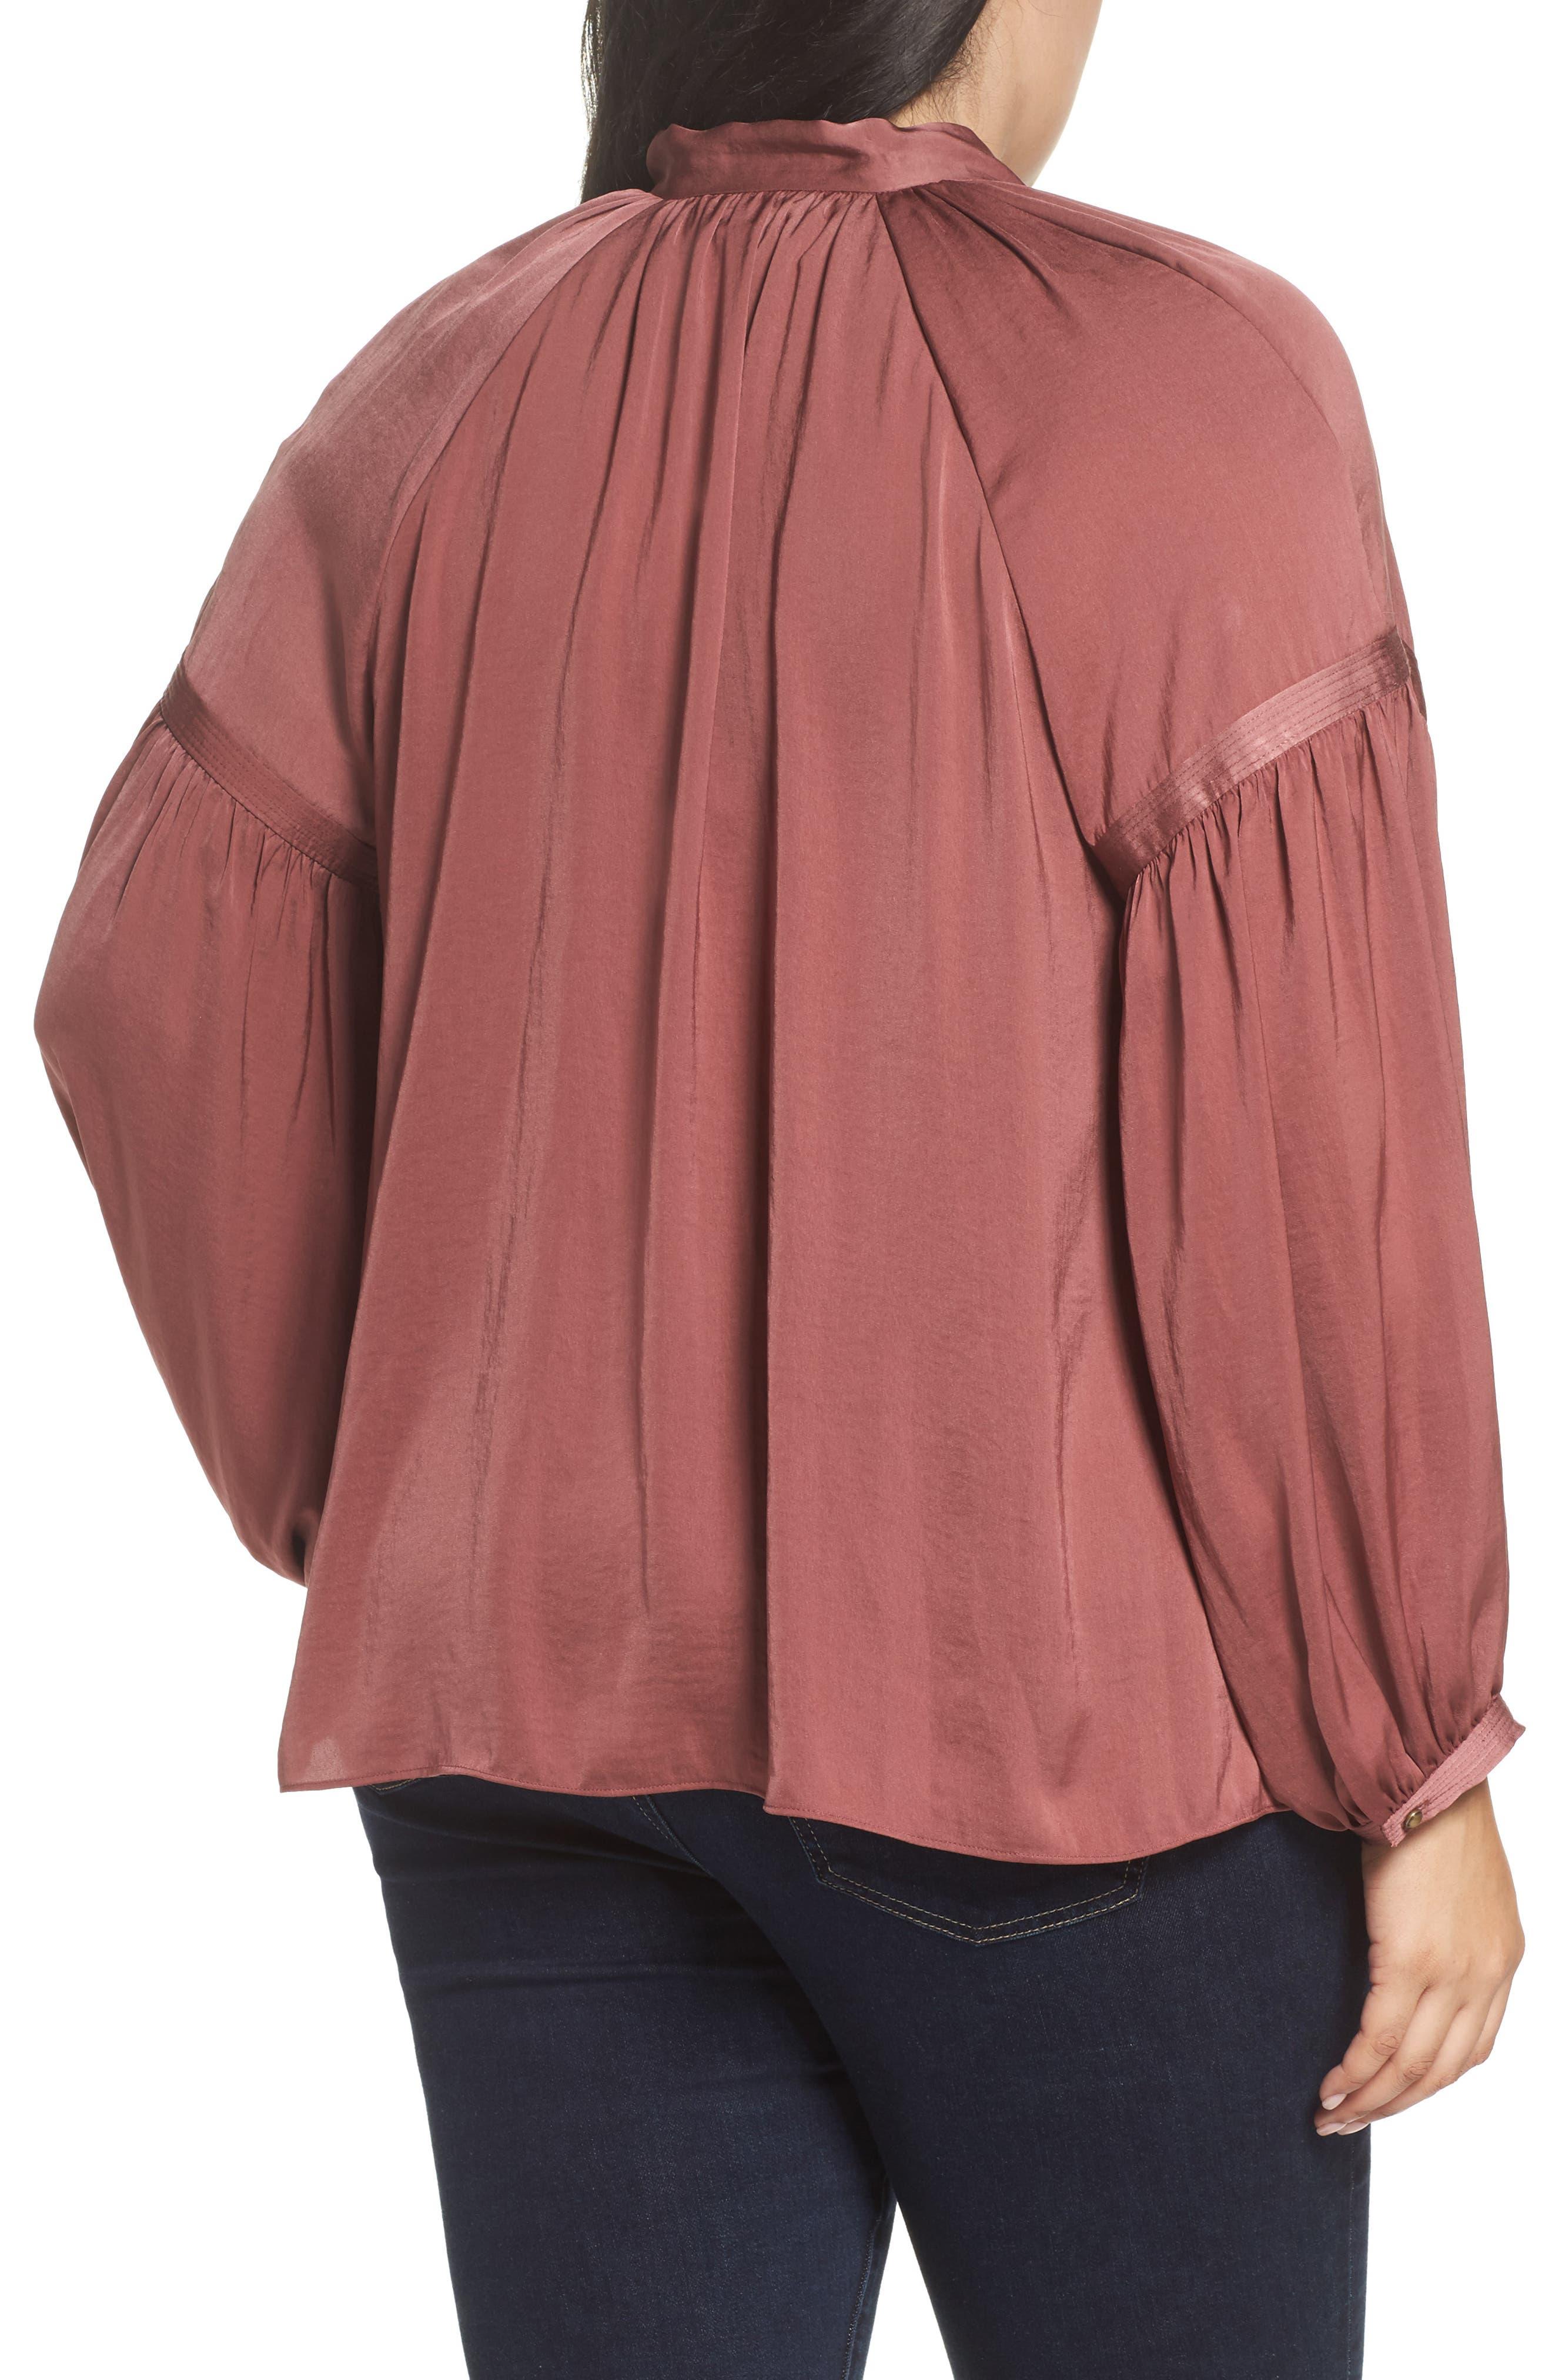 Alternate Image 2  - Lucky Brand Jenna Peasant Top (Plus Size)